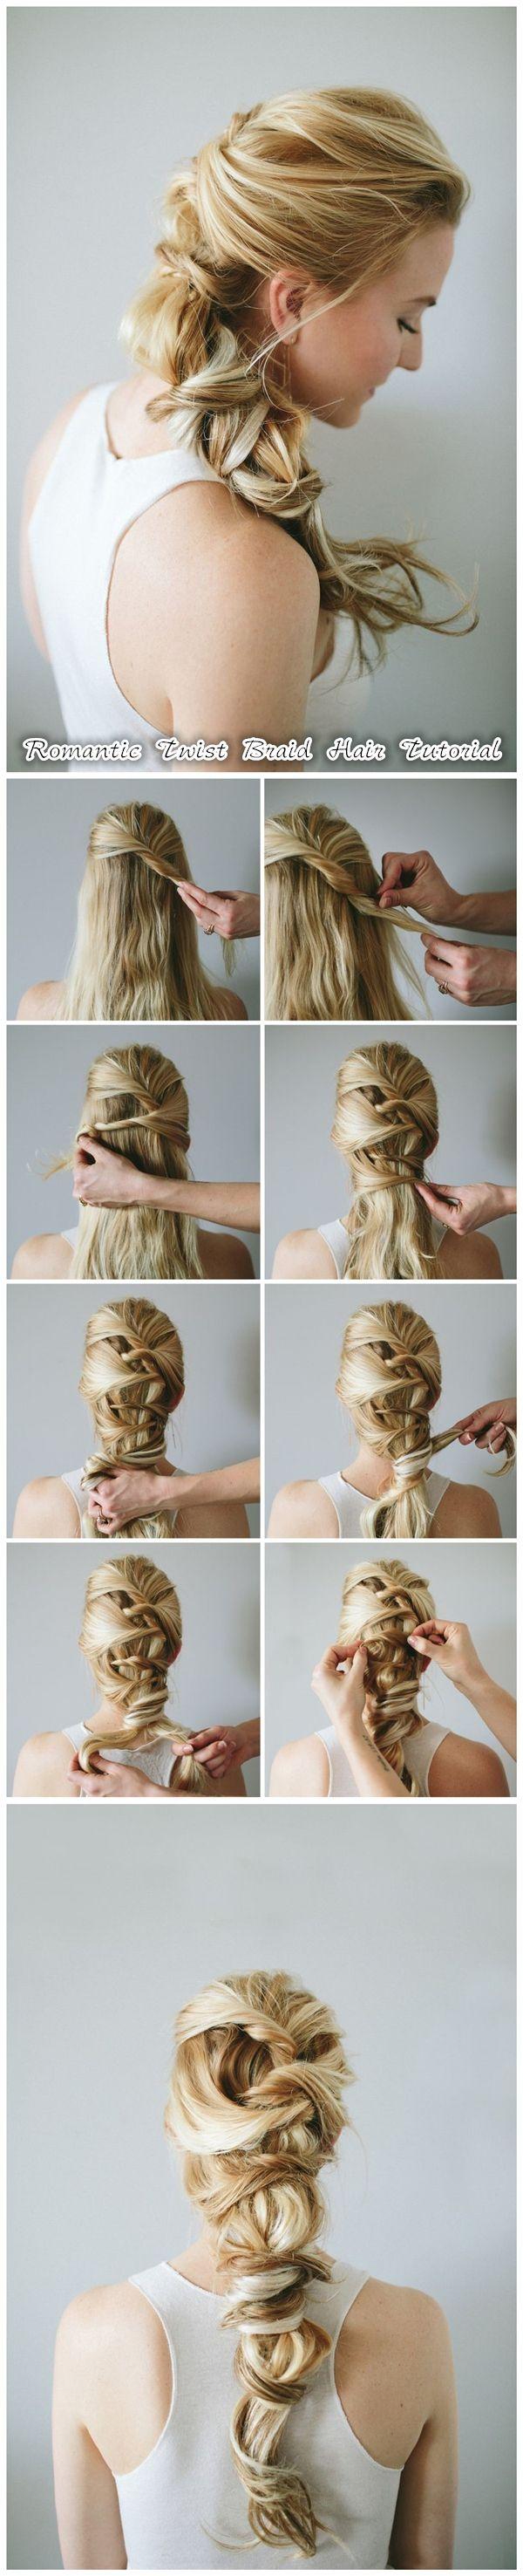 DIY | Romantic Twist Braid Hair Tutorial